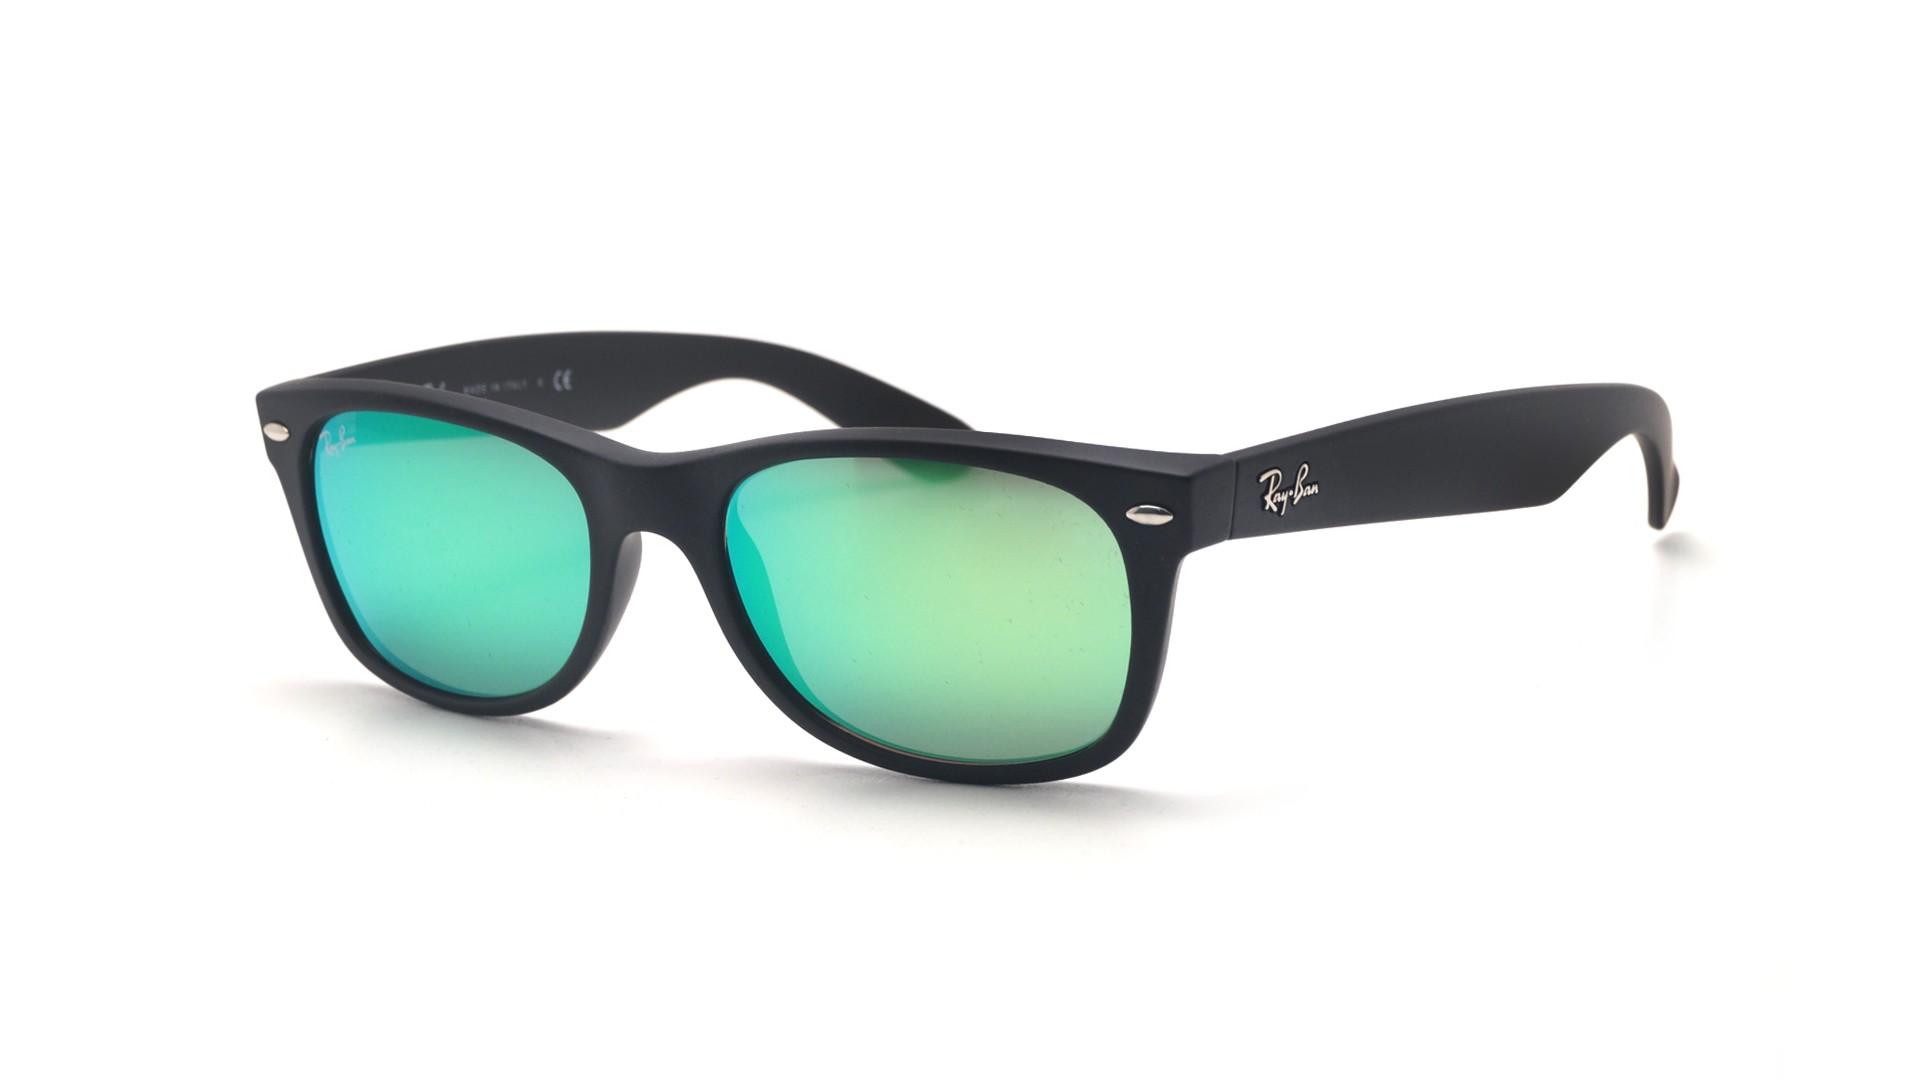 076d2305da420 Sunglasses Ray-Ban New Wayfarer Black Matte RB2132 622 19 52-18 Small Mirror